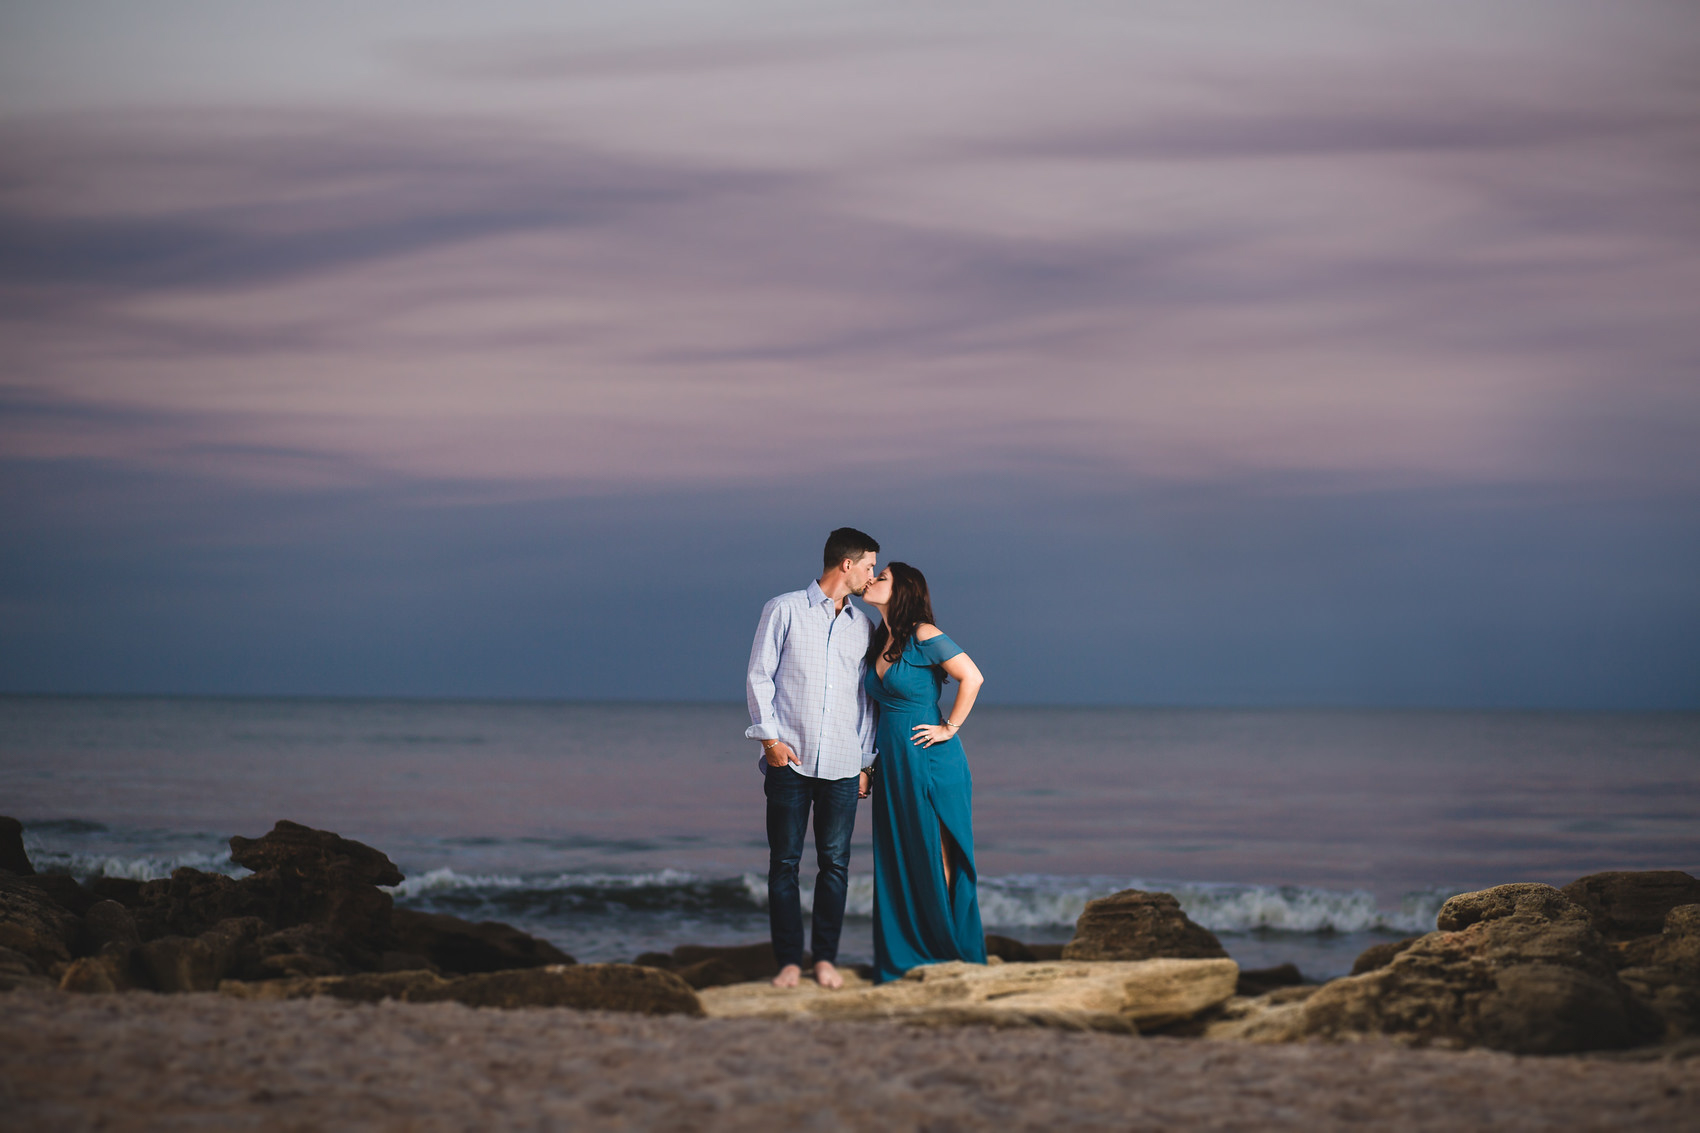 adam-szarmack-jacksonville-wedding-photographer-washington-oaks-gardens-state-park-engagement-30.jpg